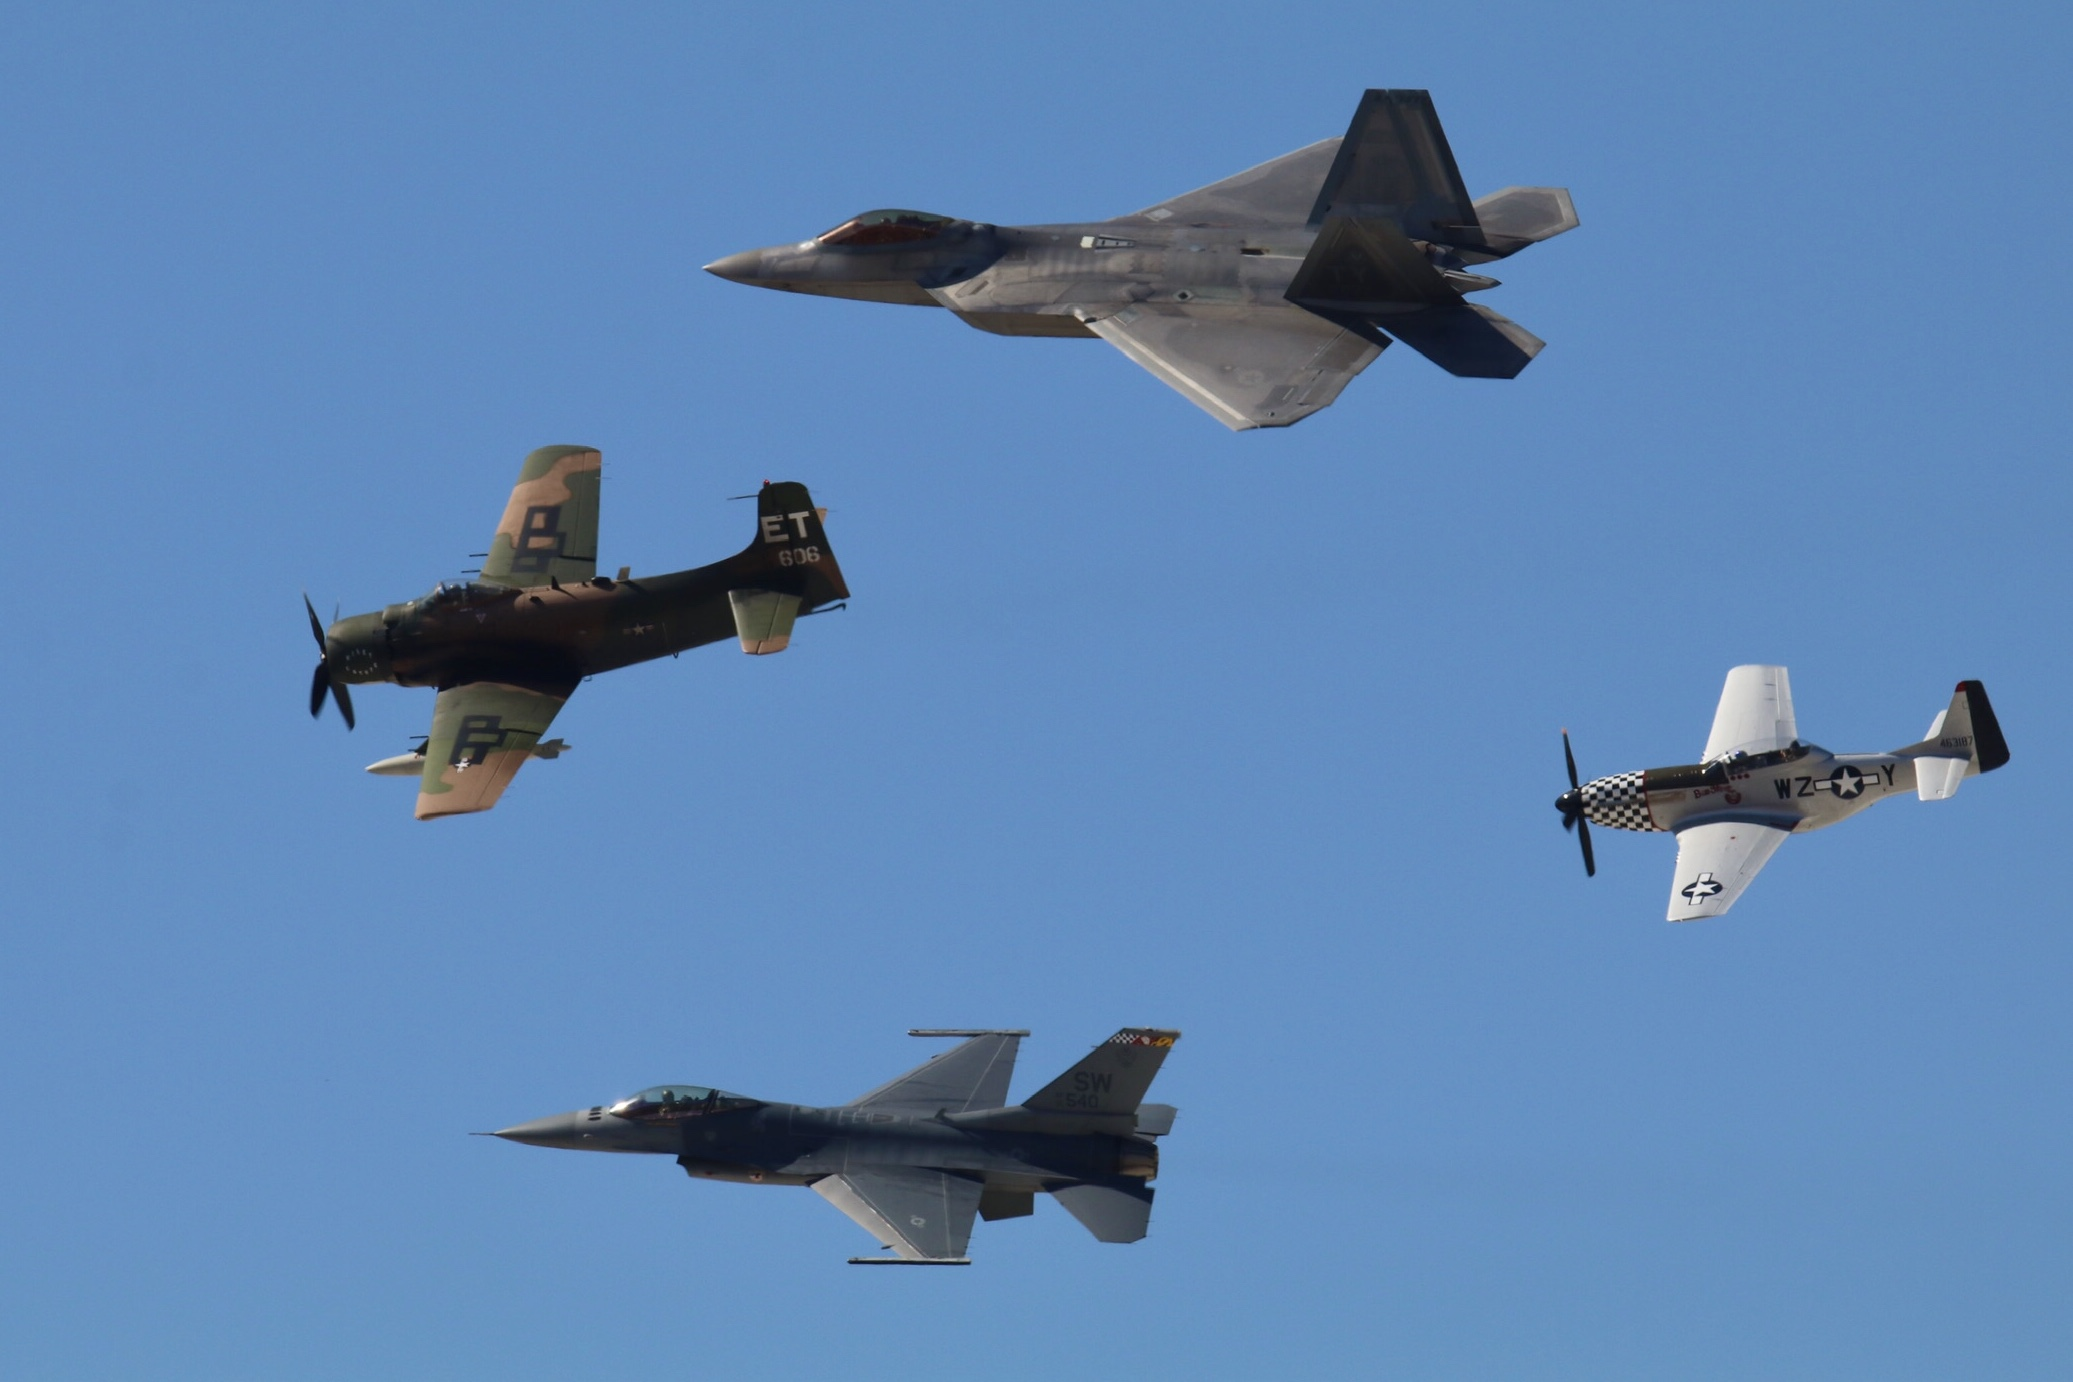 12F71C43-34AF-490E-8DE0-520003D57291.jpeg